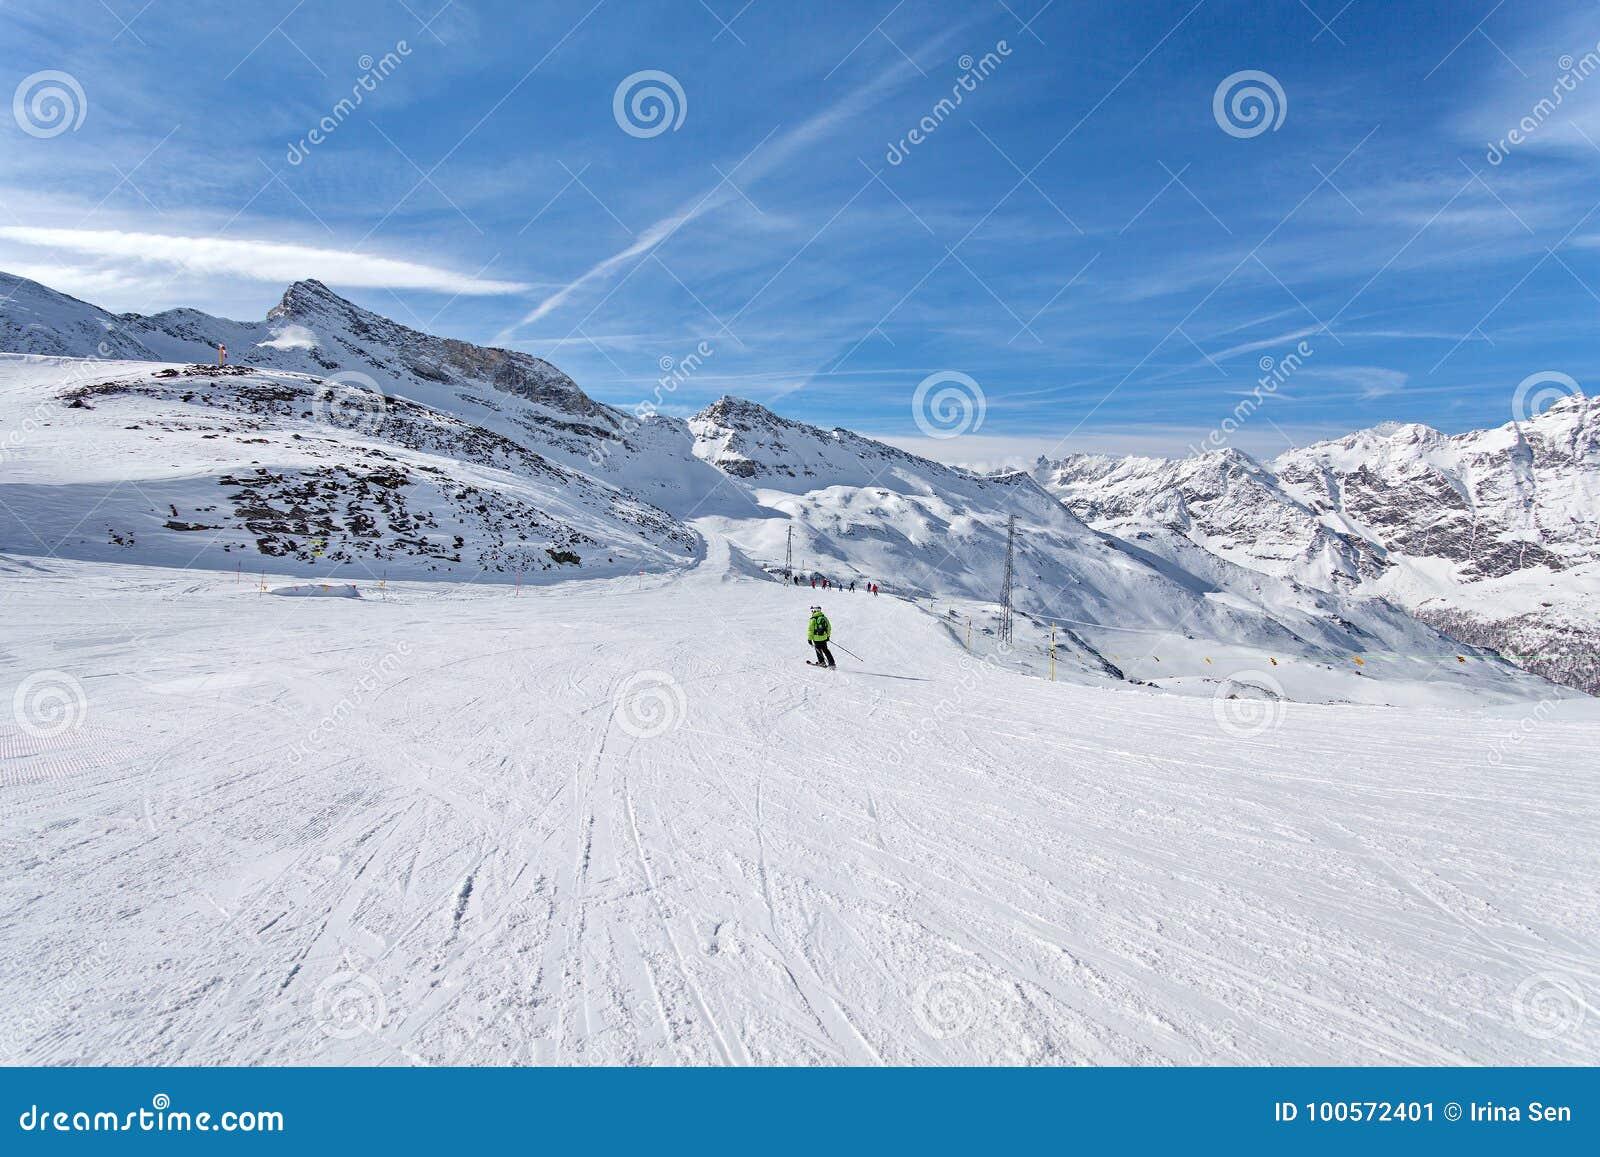 Cervinia Ski Holidays | Book Skiing Holidays in Cervinia